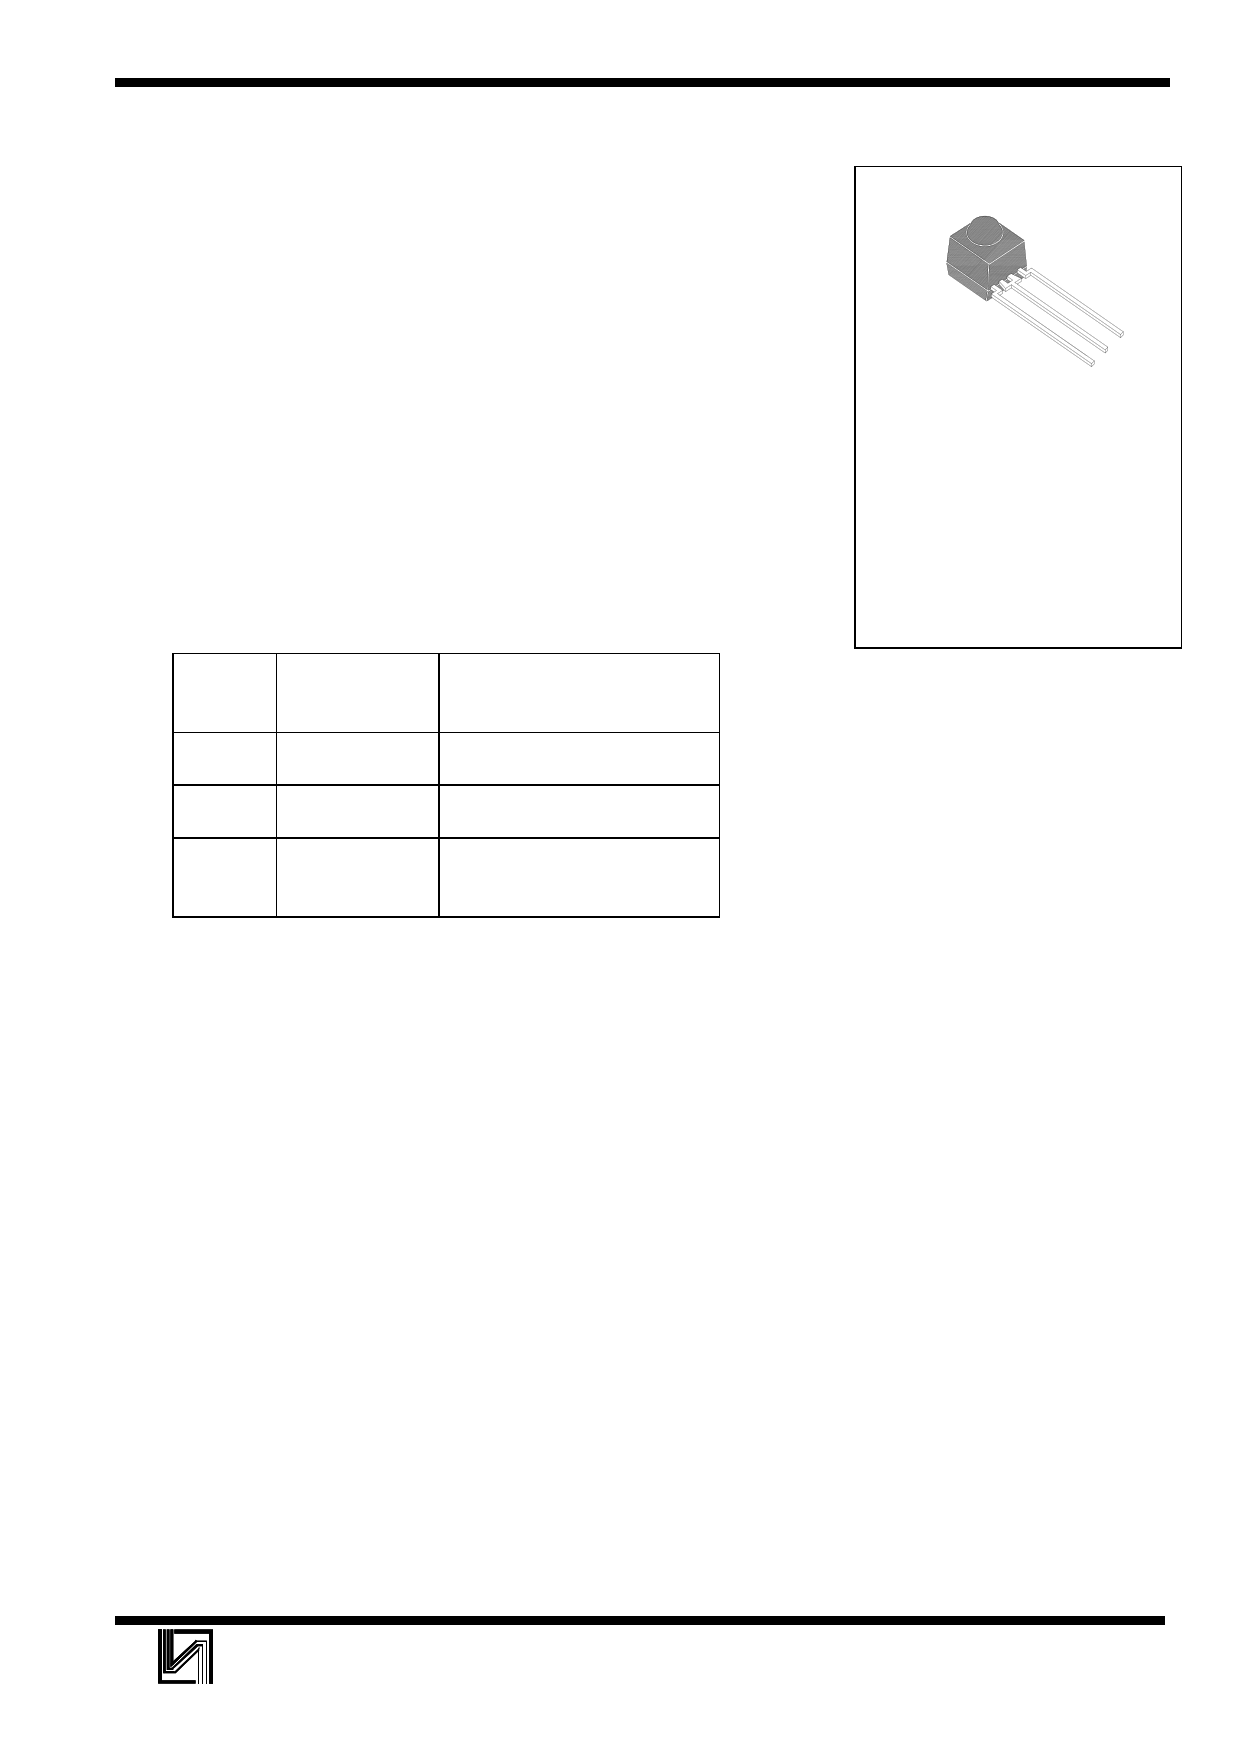 ILOP1838SS Datasheet, ILOP1838SS PDF,ピン配置, 機能